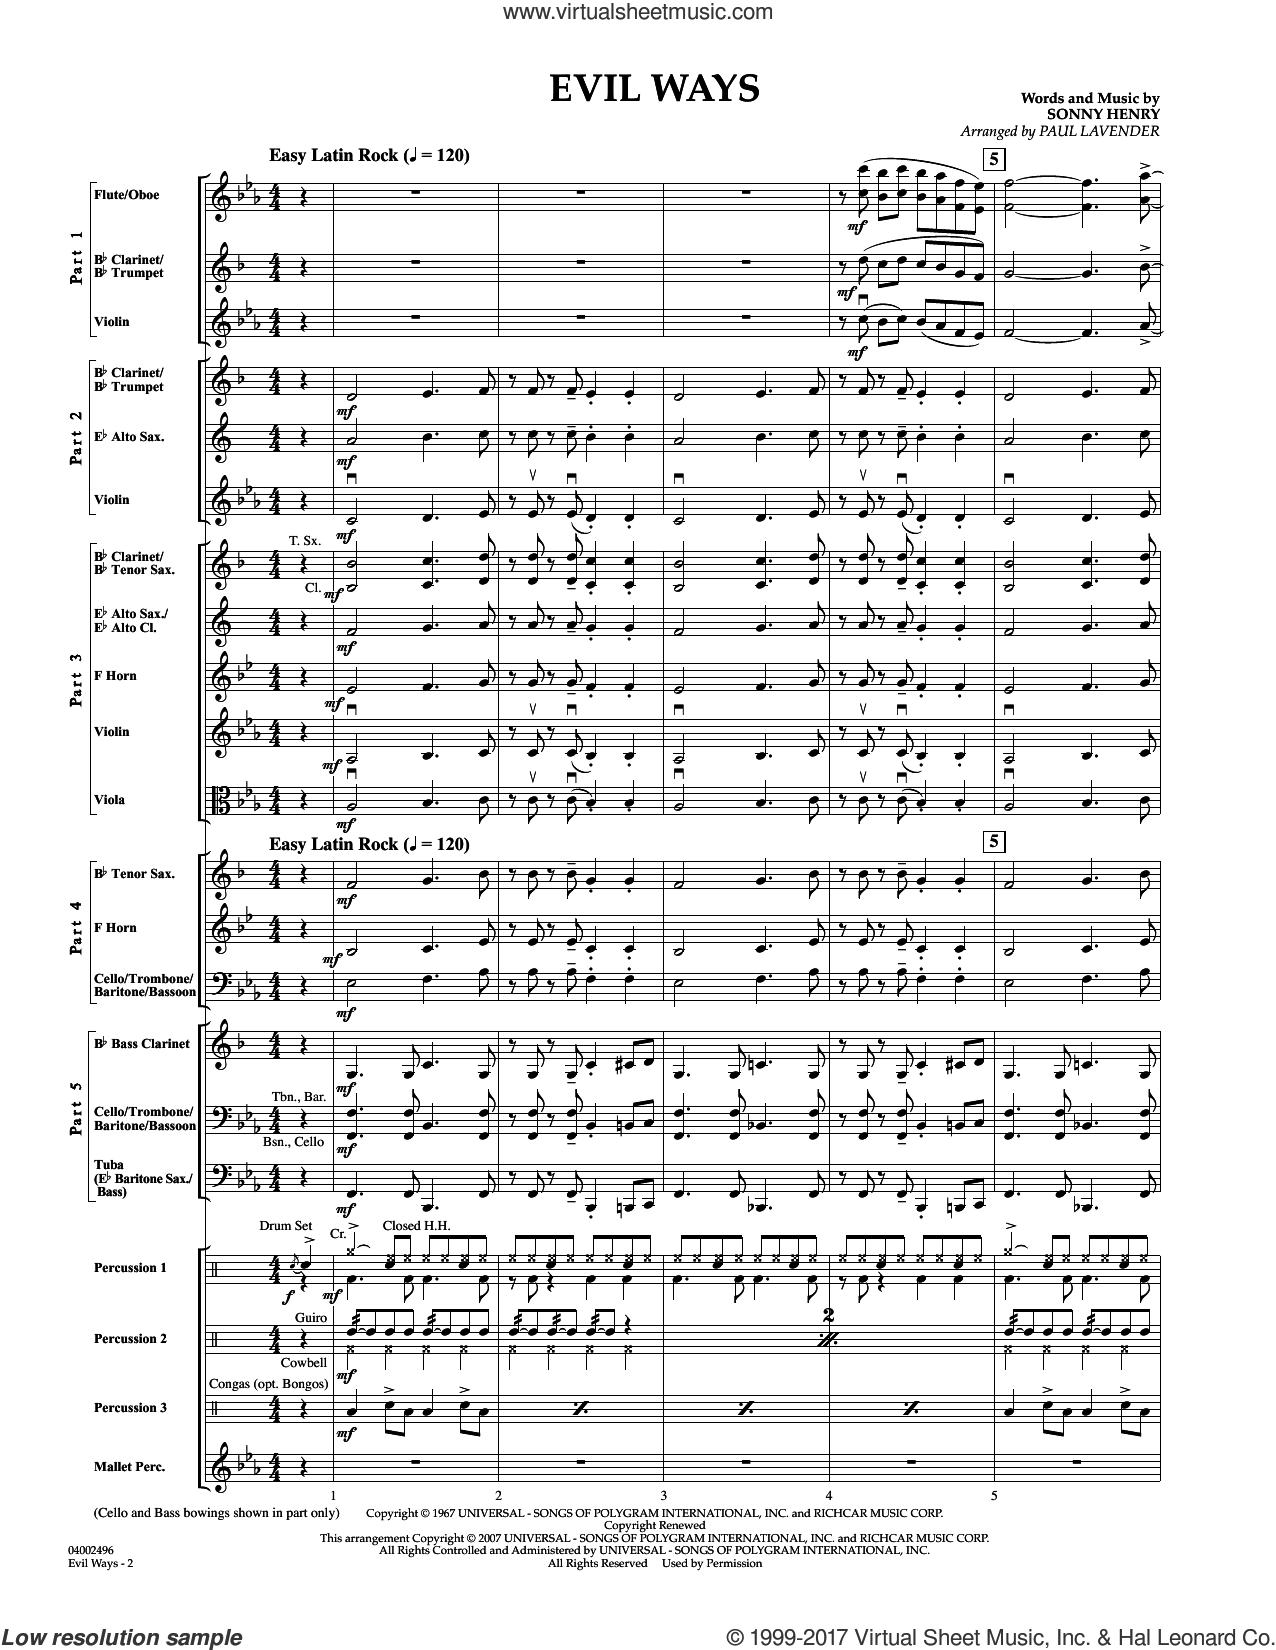 Santana - Evil Ways (Flex-Band) sheet music (complete collection) for  concert band